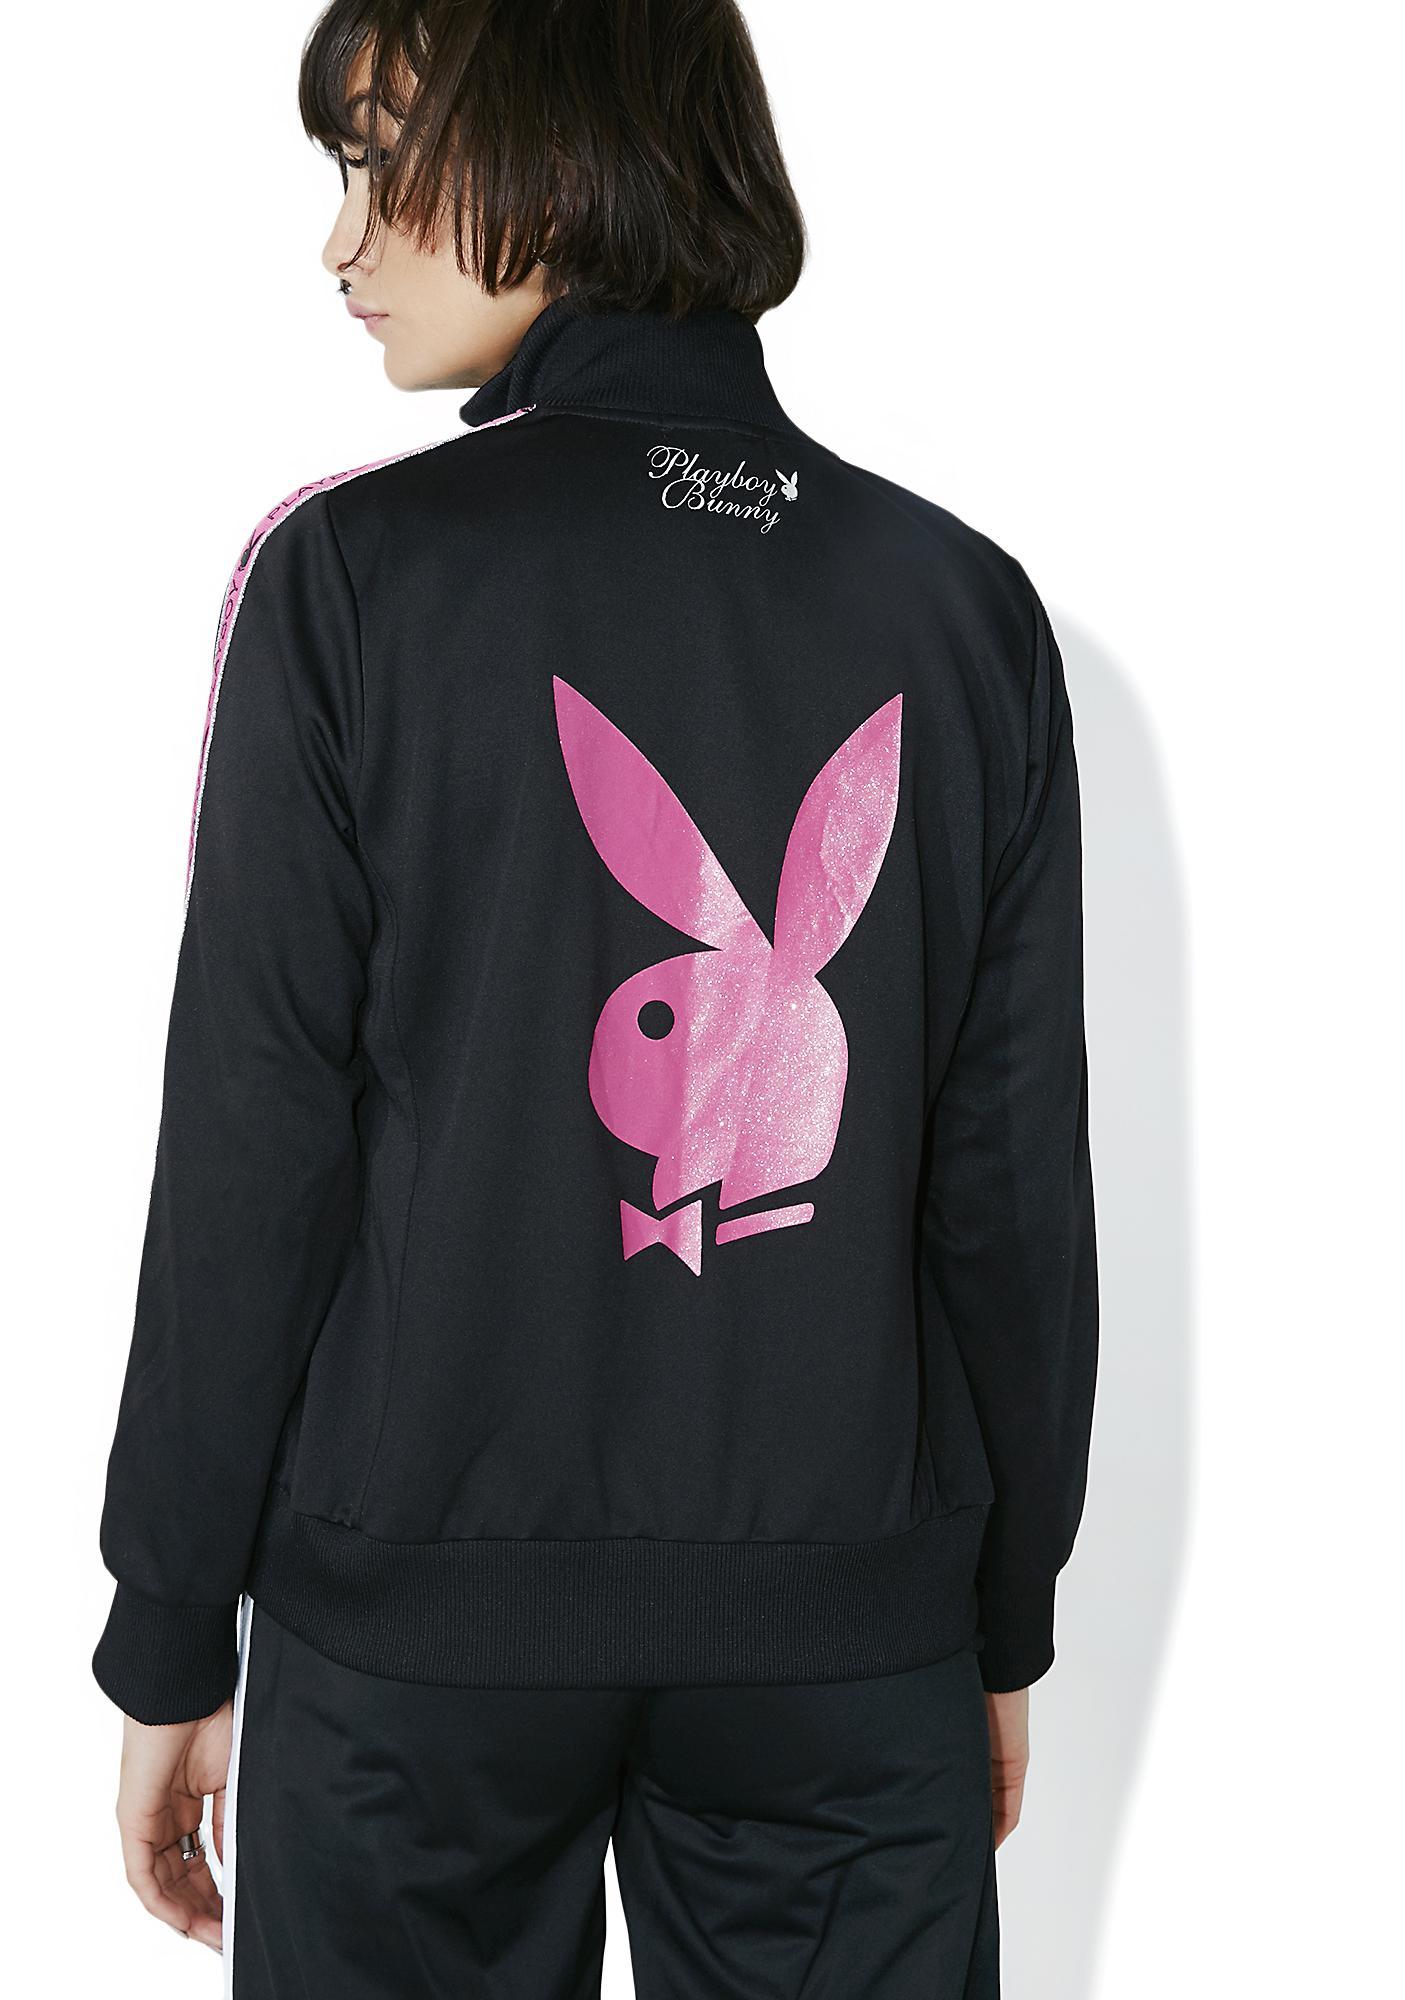 Vintage Hott Pink Playboy Track Jacket